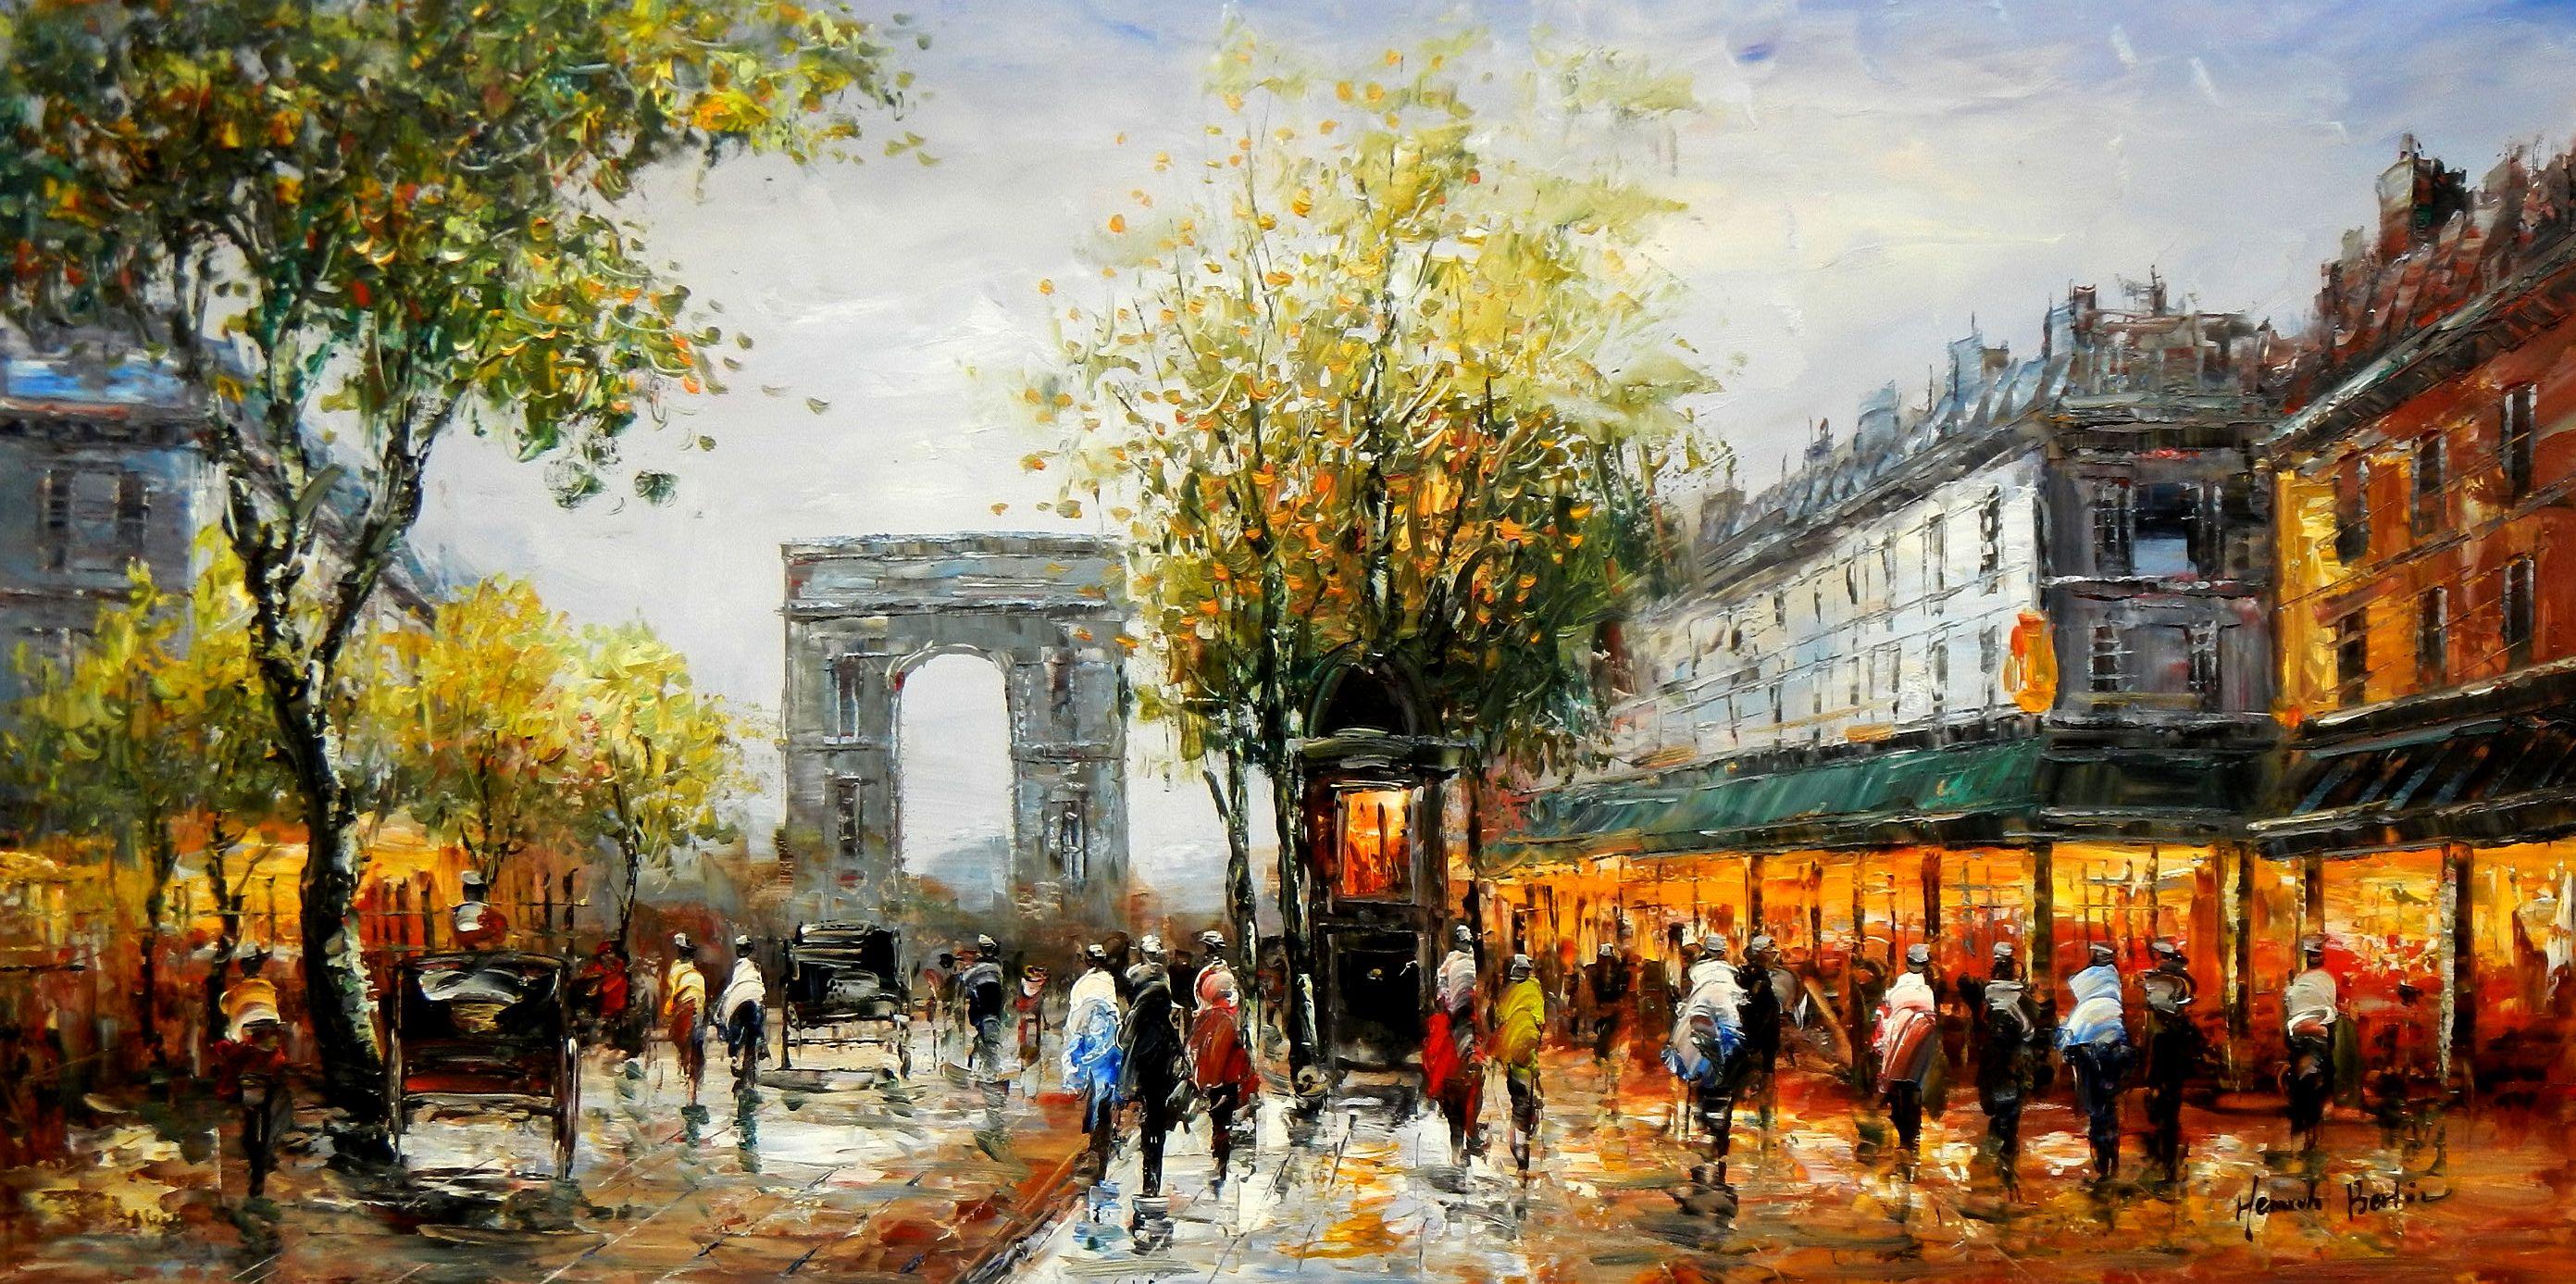 Modern Art - Sommer am Arc de Triomphe Paris f94631 60x120cm Ölbild handgemalt